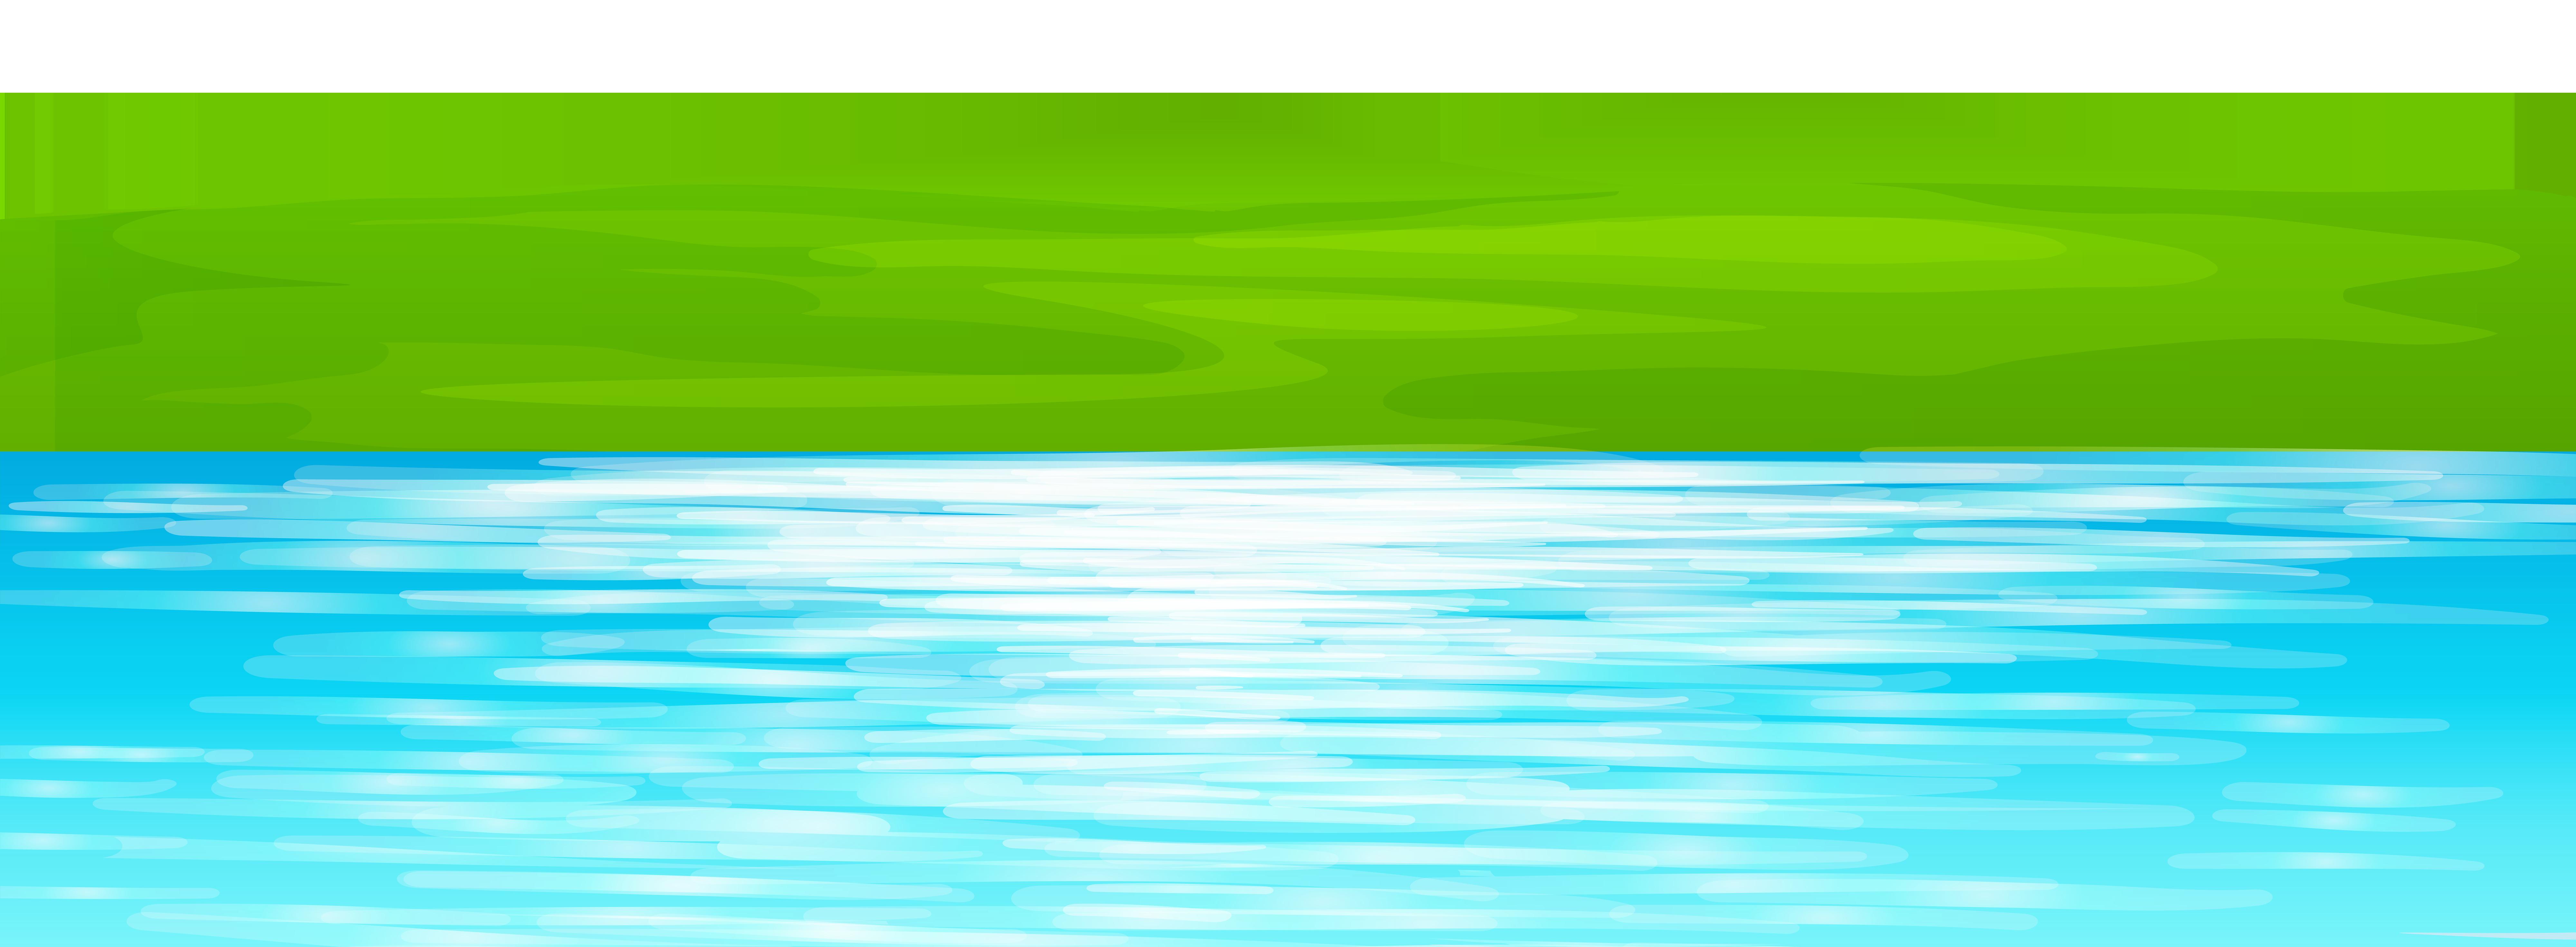 Lake clipart lake swimming. Water resources green pool